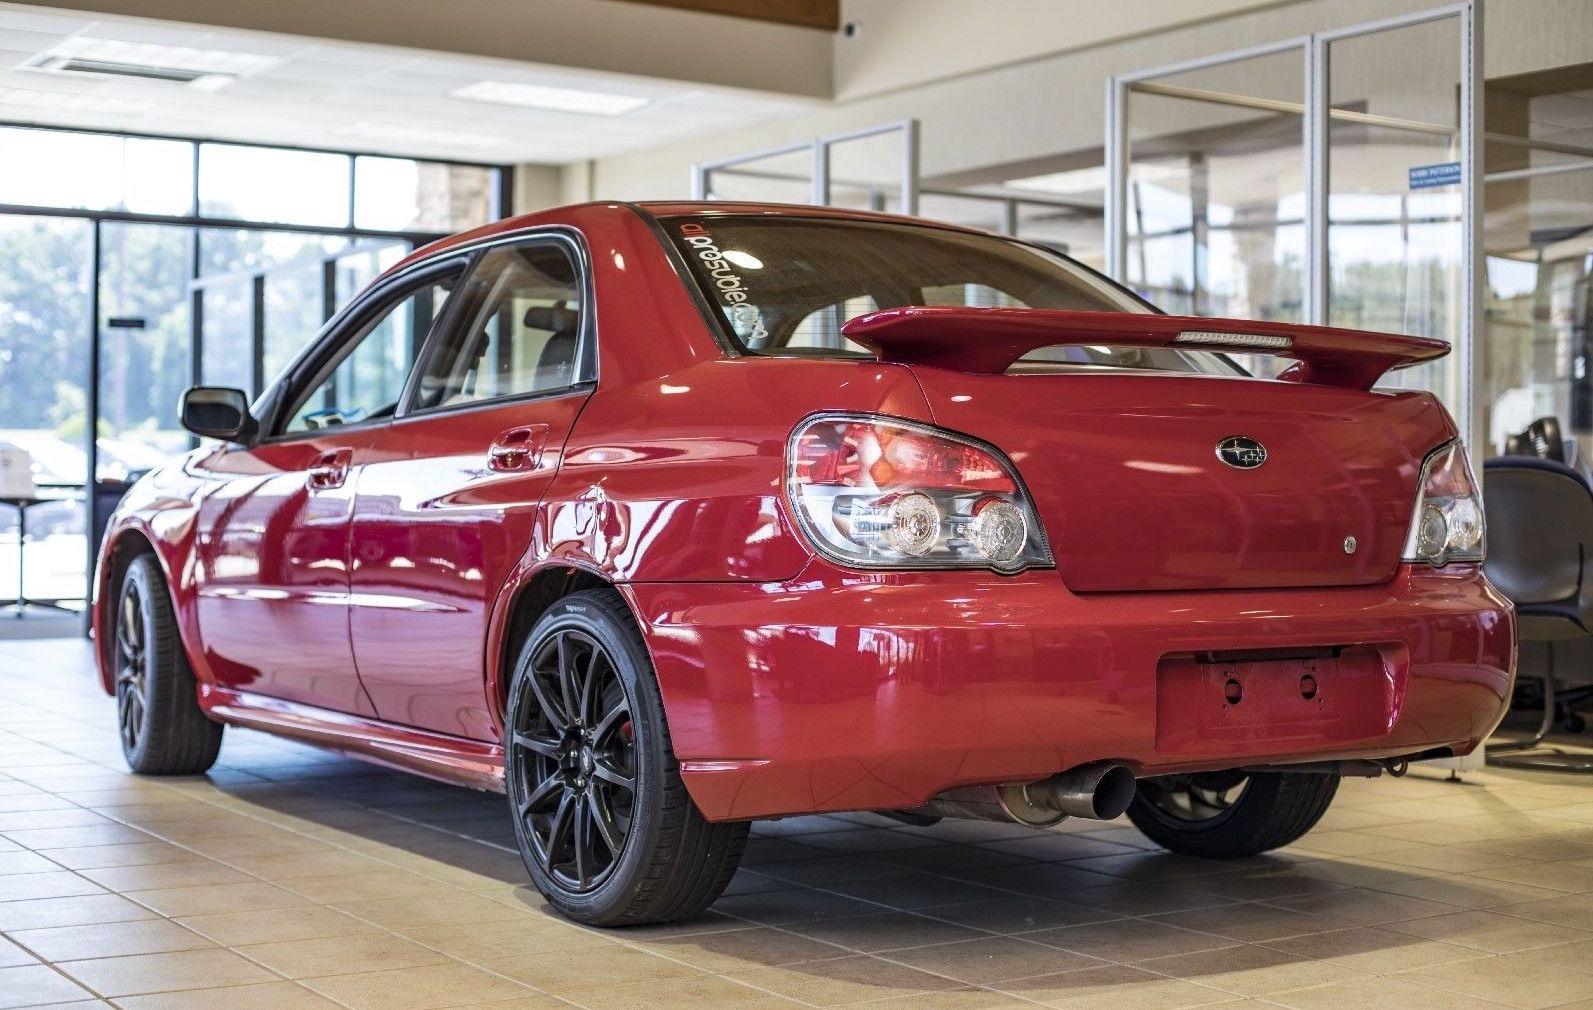 Subaru Wrx From Baby Driver Rear